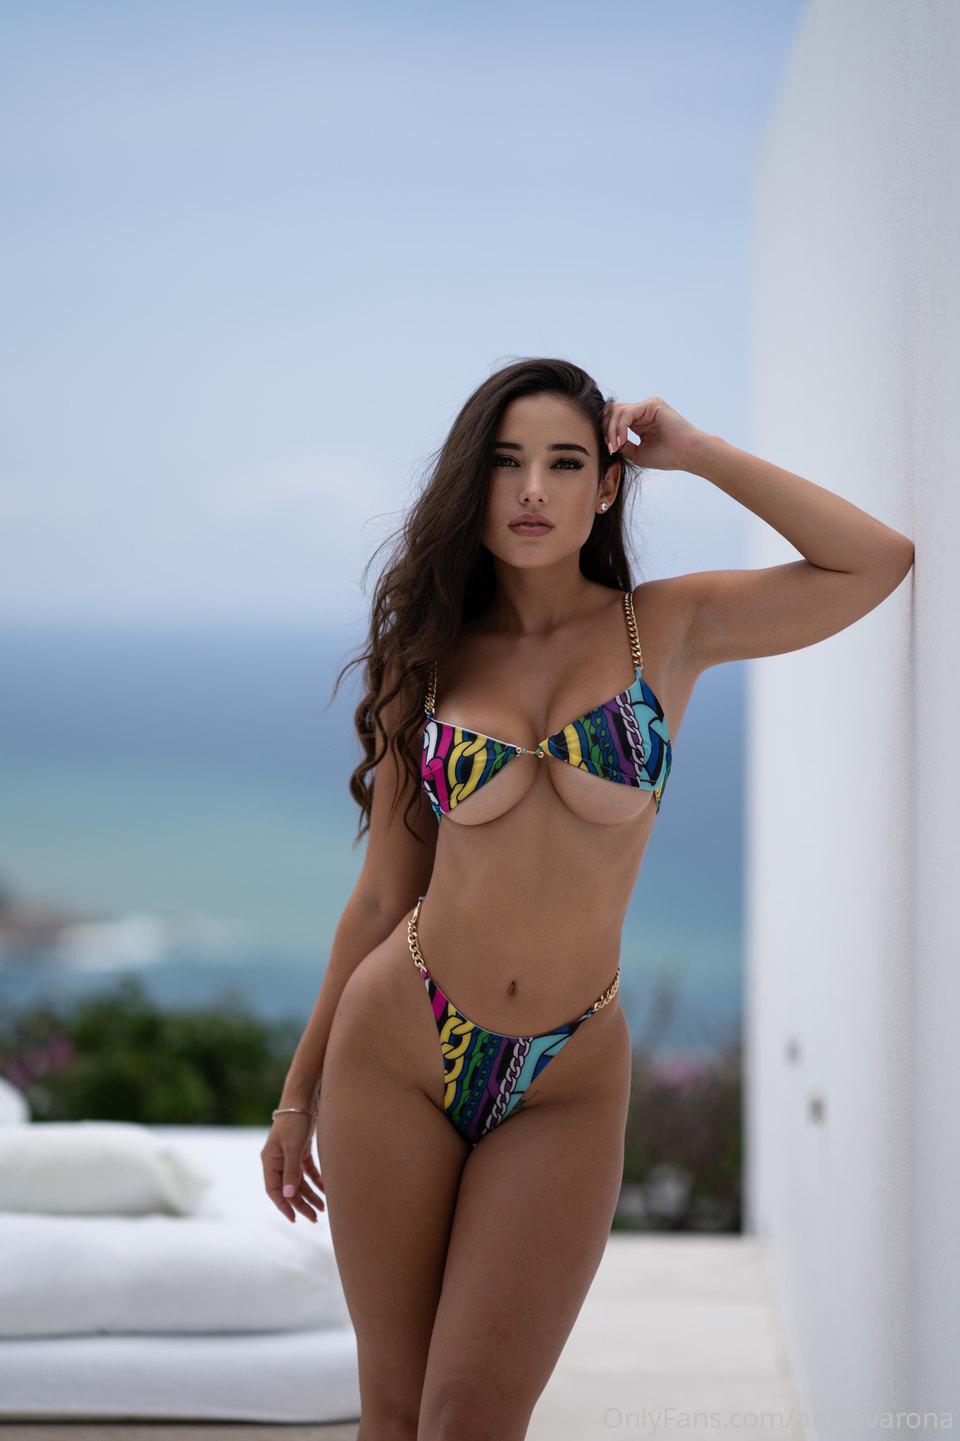 Angie Varona Onlyfans 0163